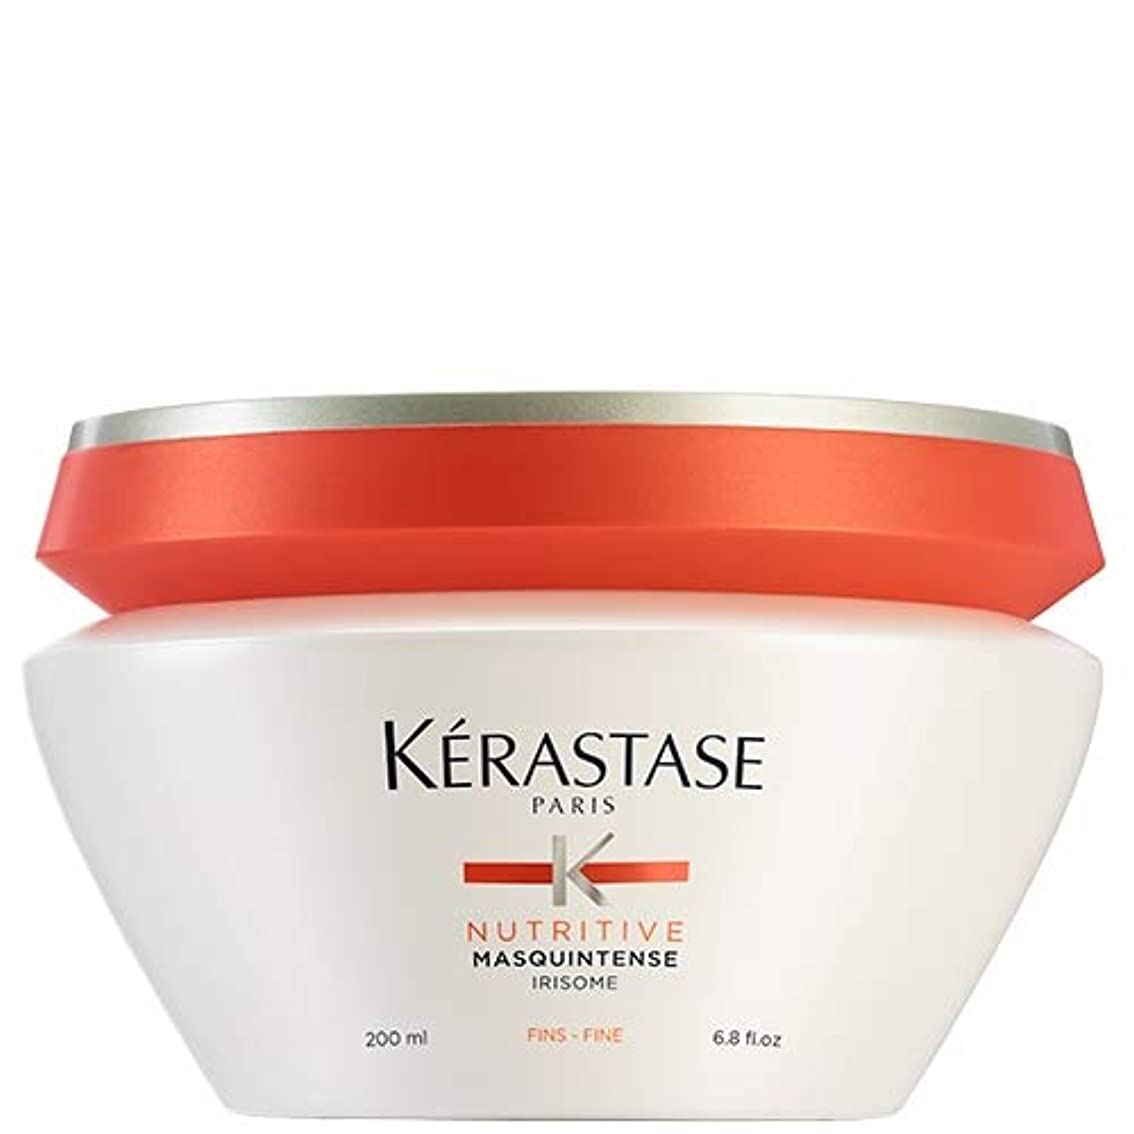 Kerastase Masquintense Fine 200 ml (6.8 oz.) (並行輸入品)